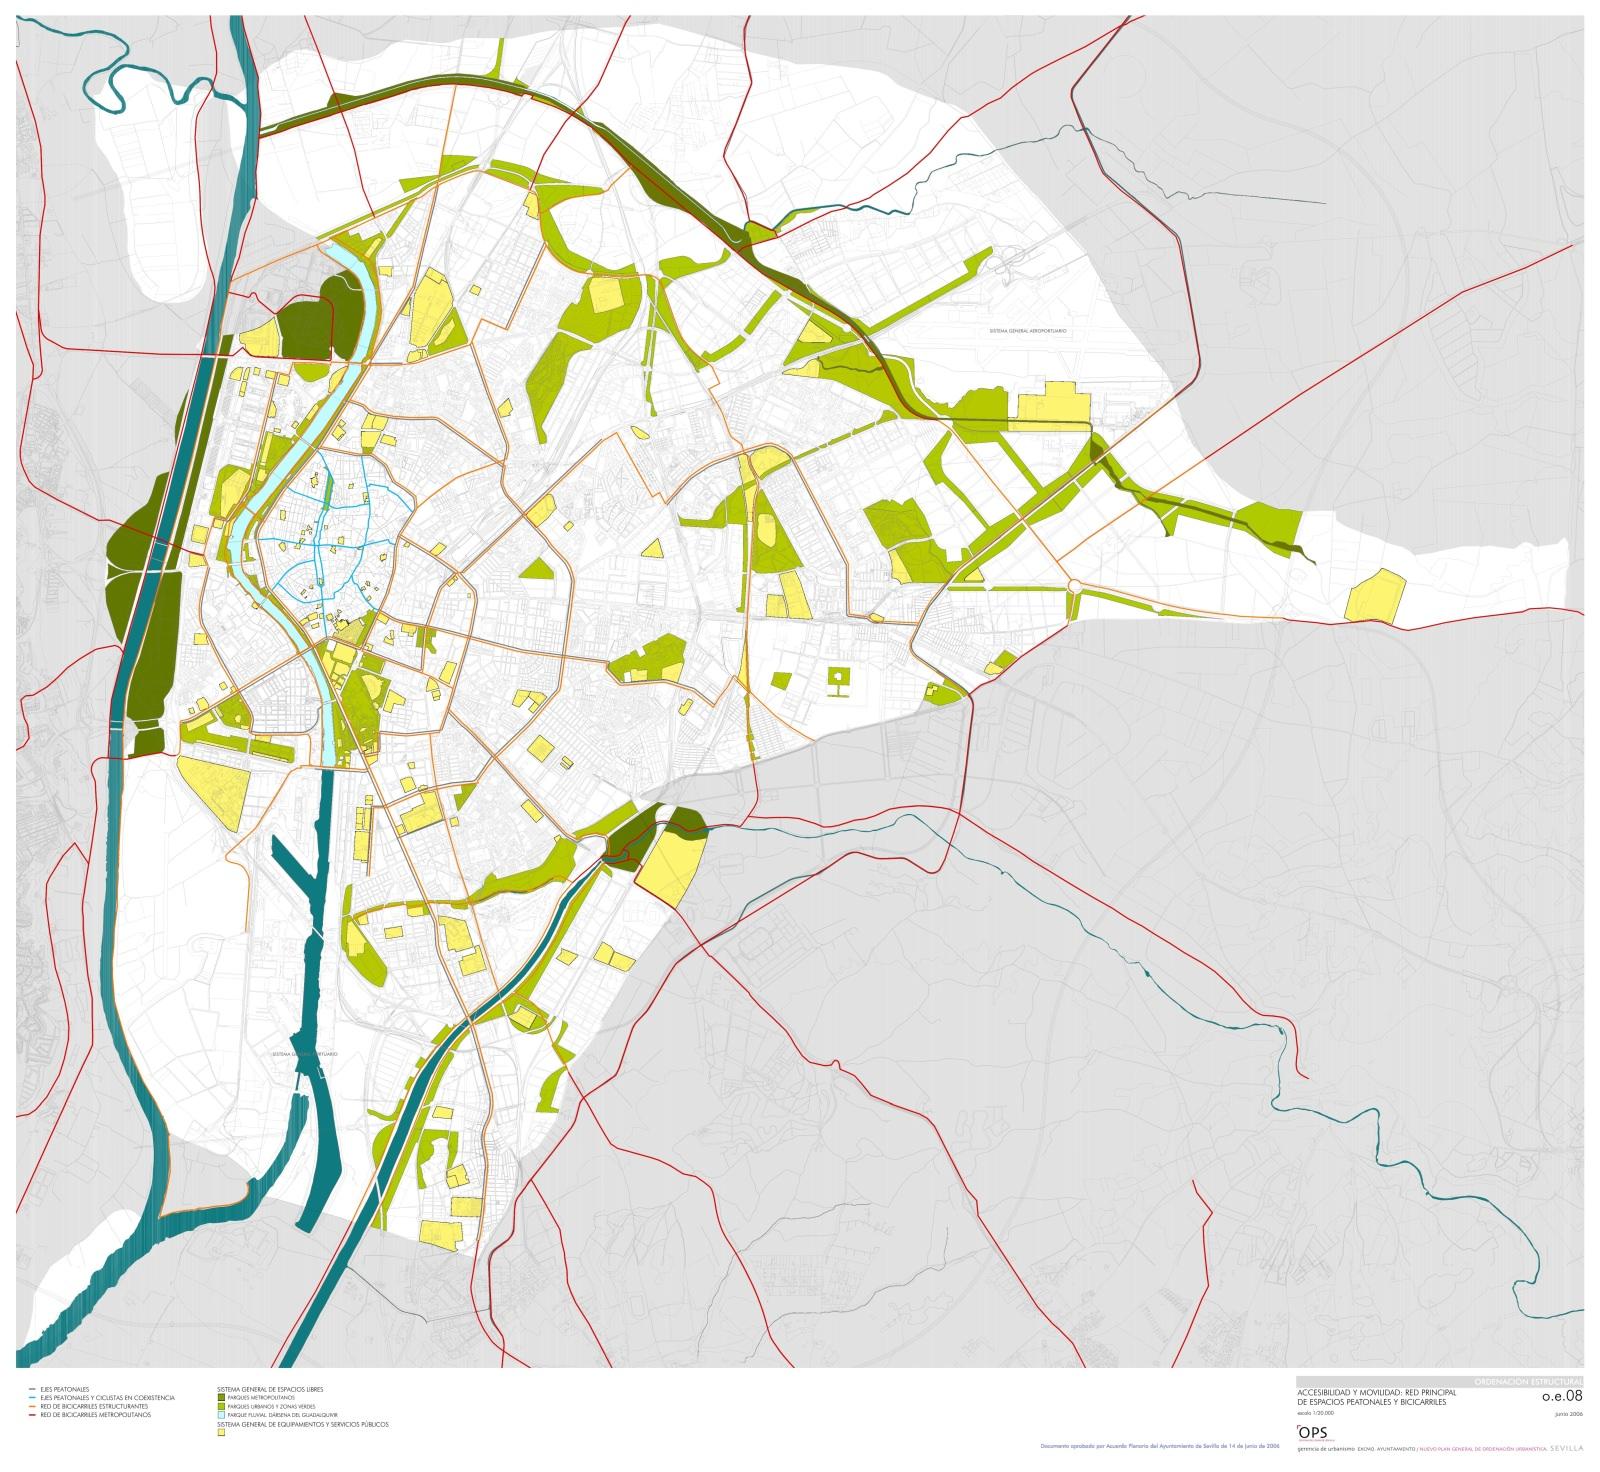 Zielnetz Radverkehr Sevilla 2006